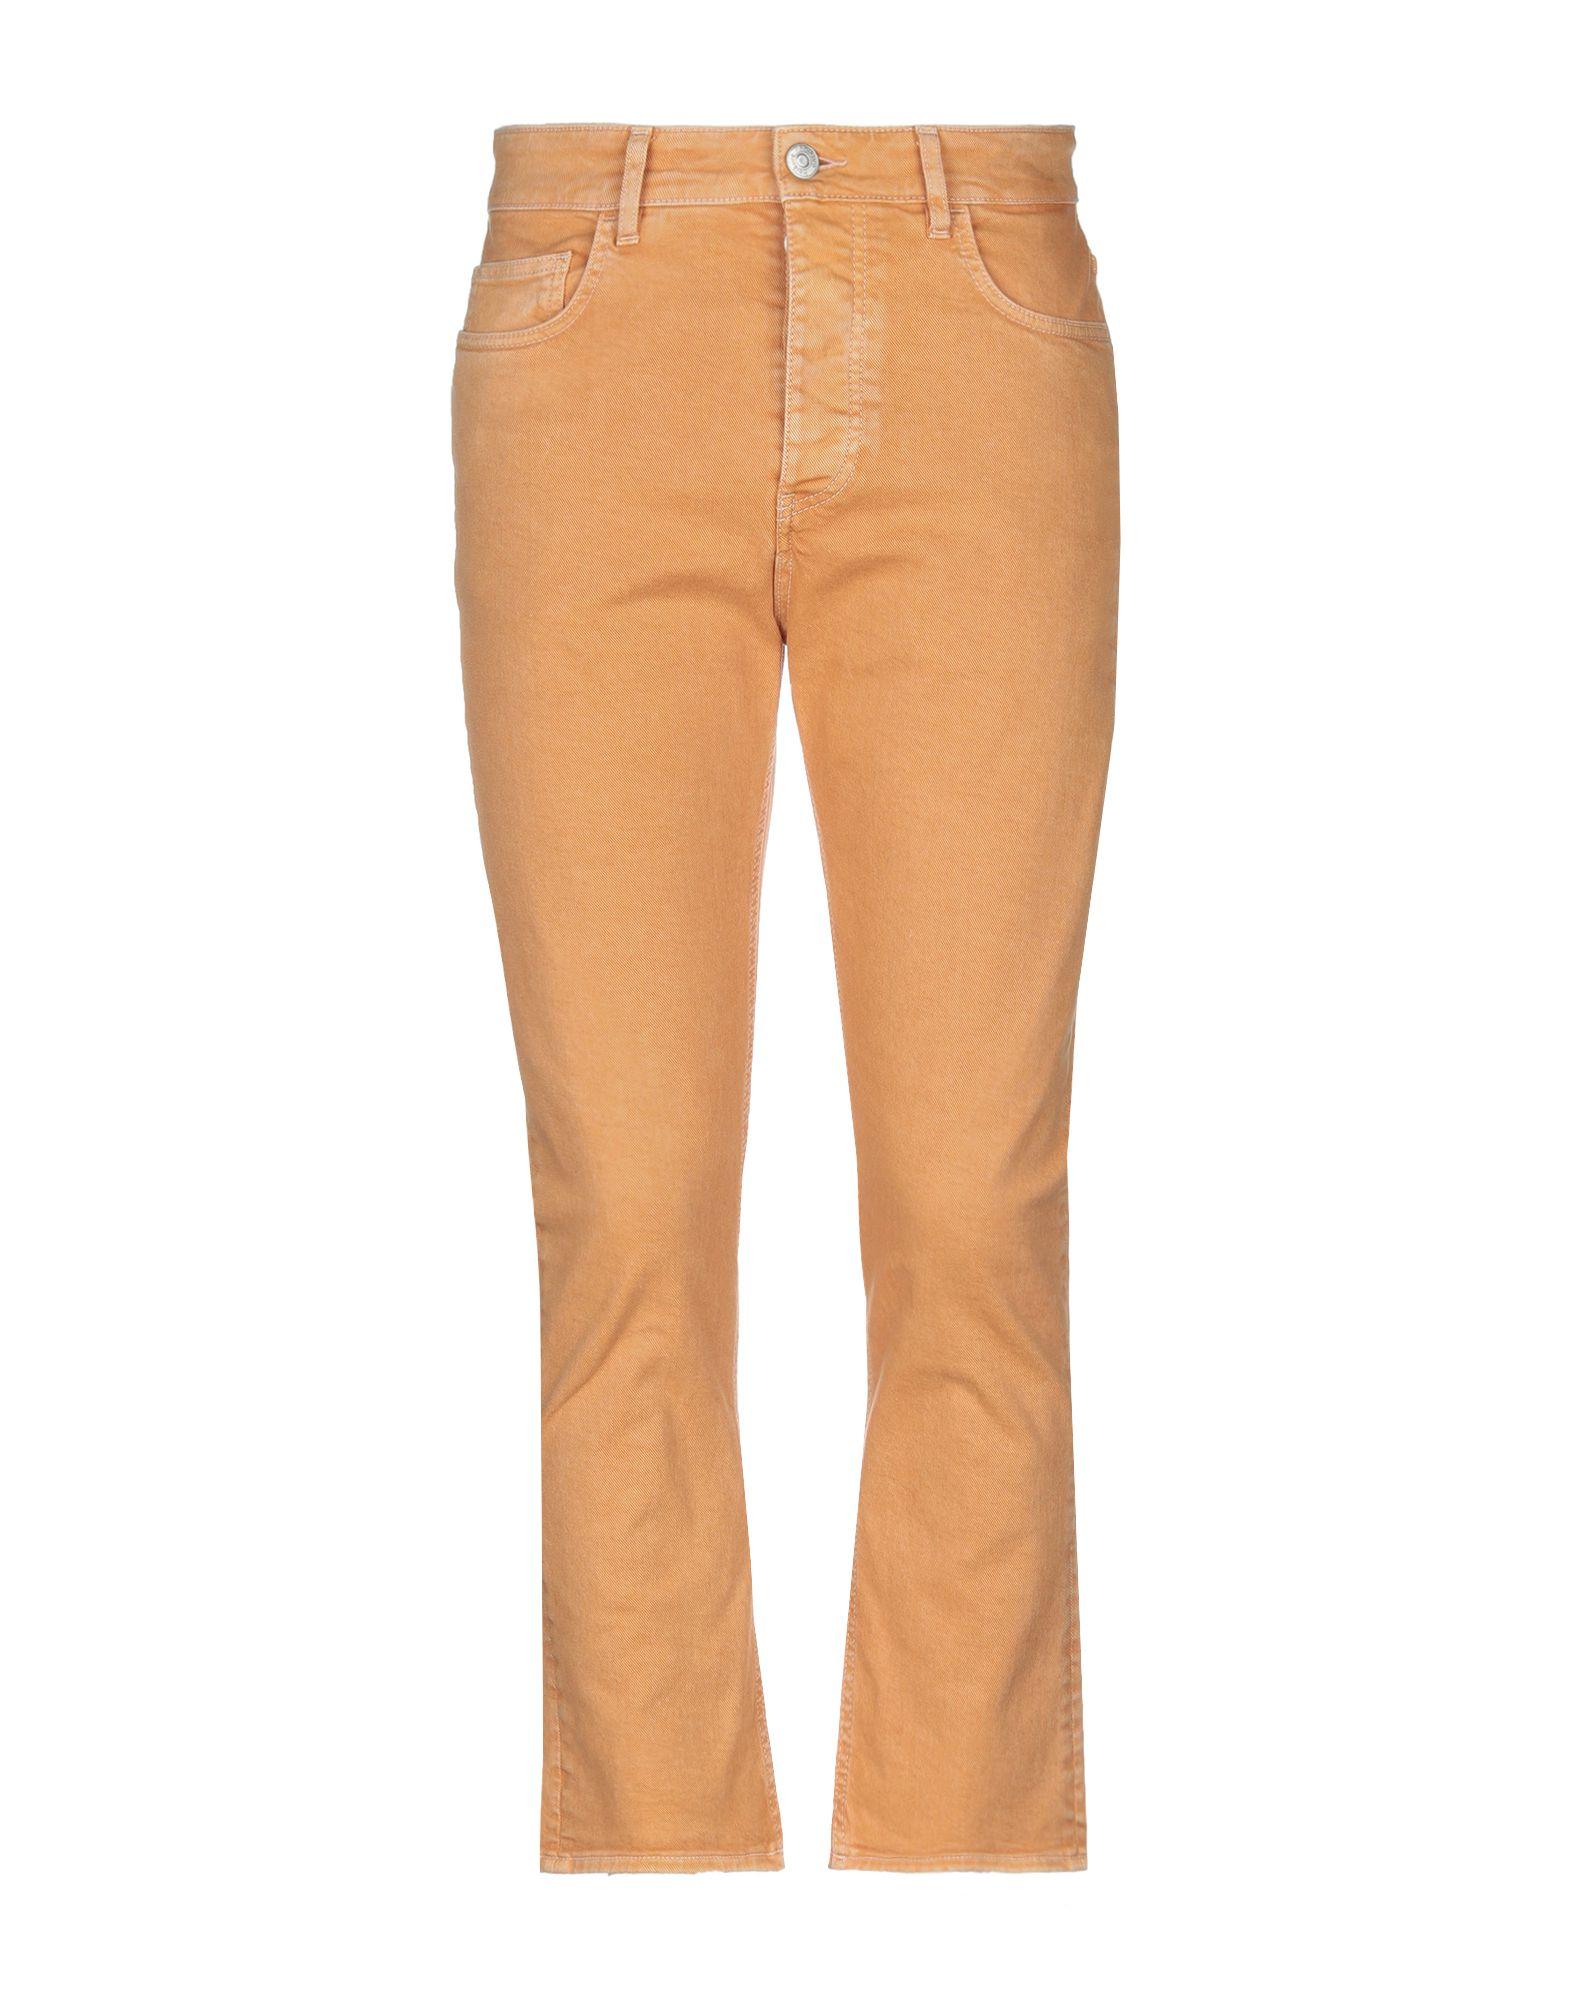 Pantaloni Jeans Haikure Haikure Haikure uomo - 42691740QX 402